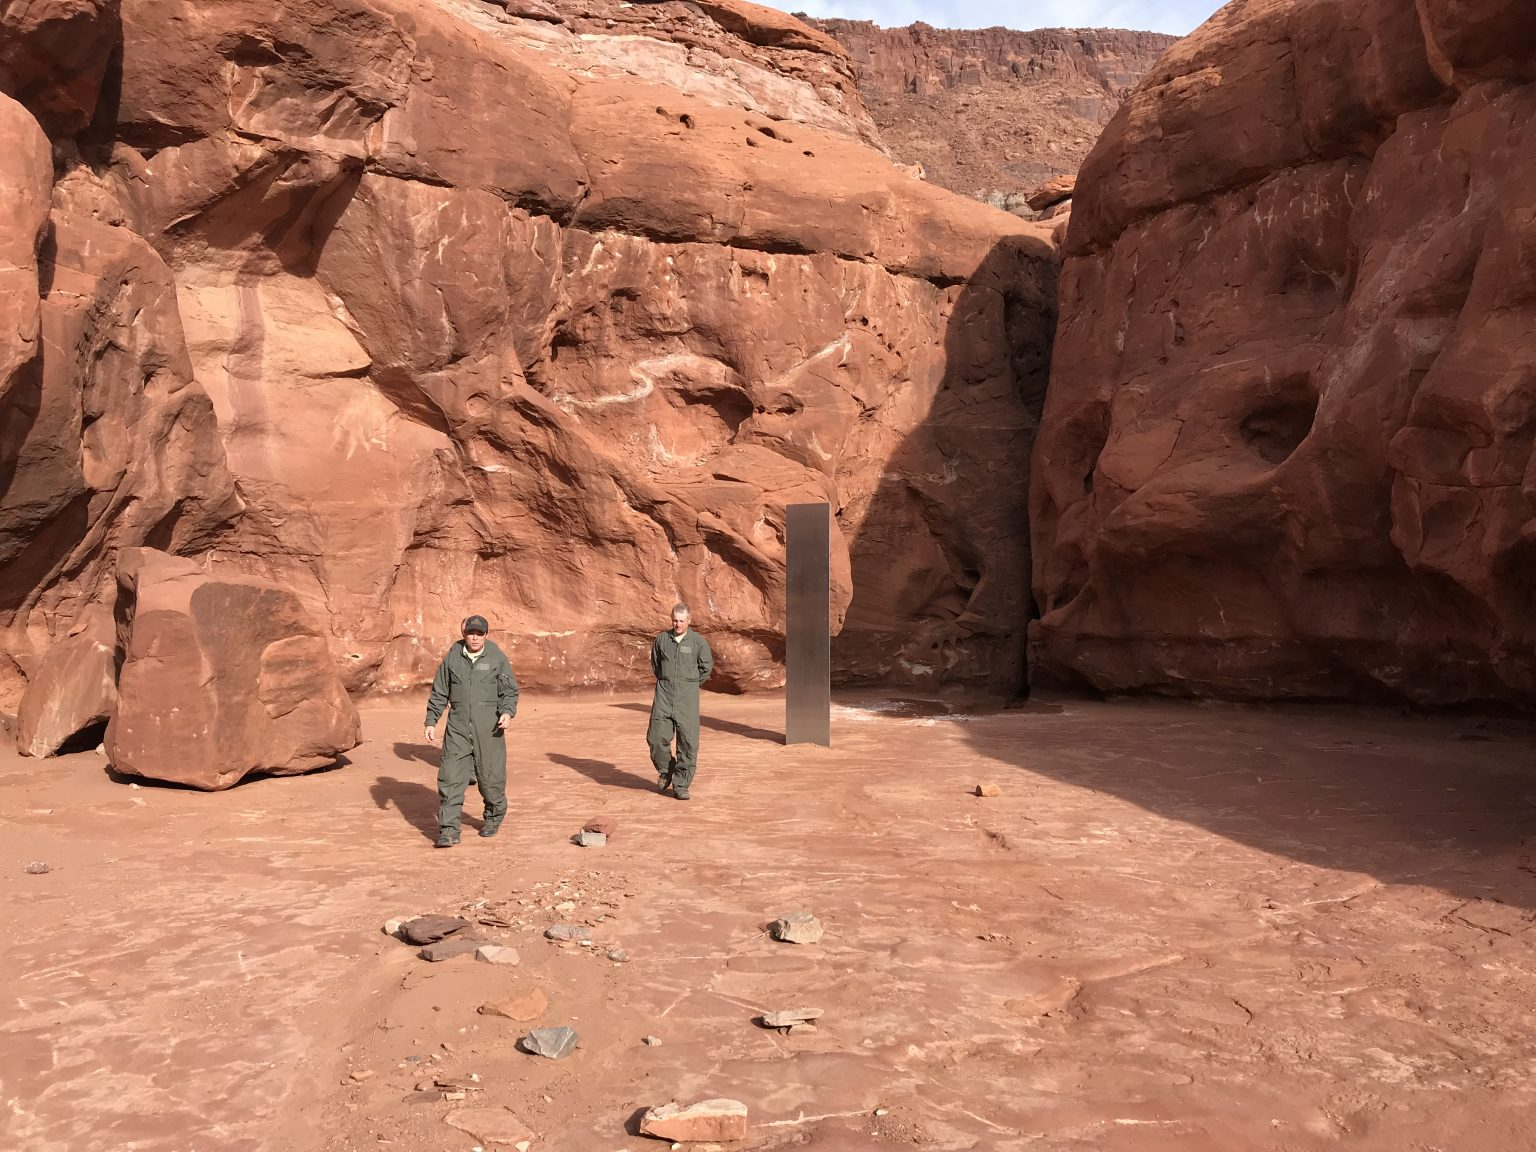 Mysteriöse Metallsäule im US-Bundesstaat Utah befeuert Fantasie